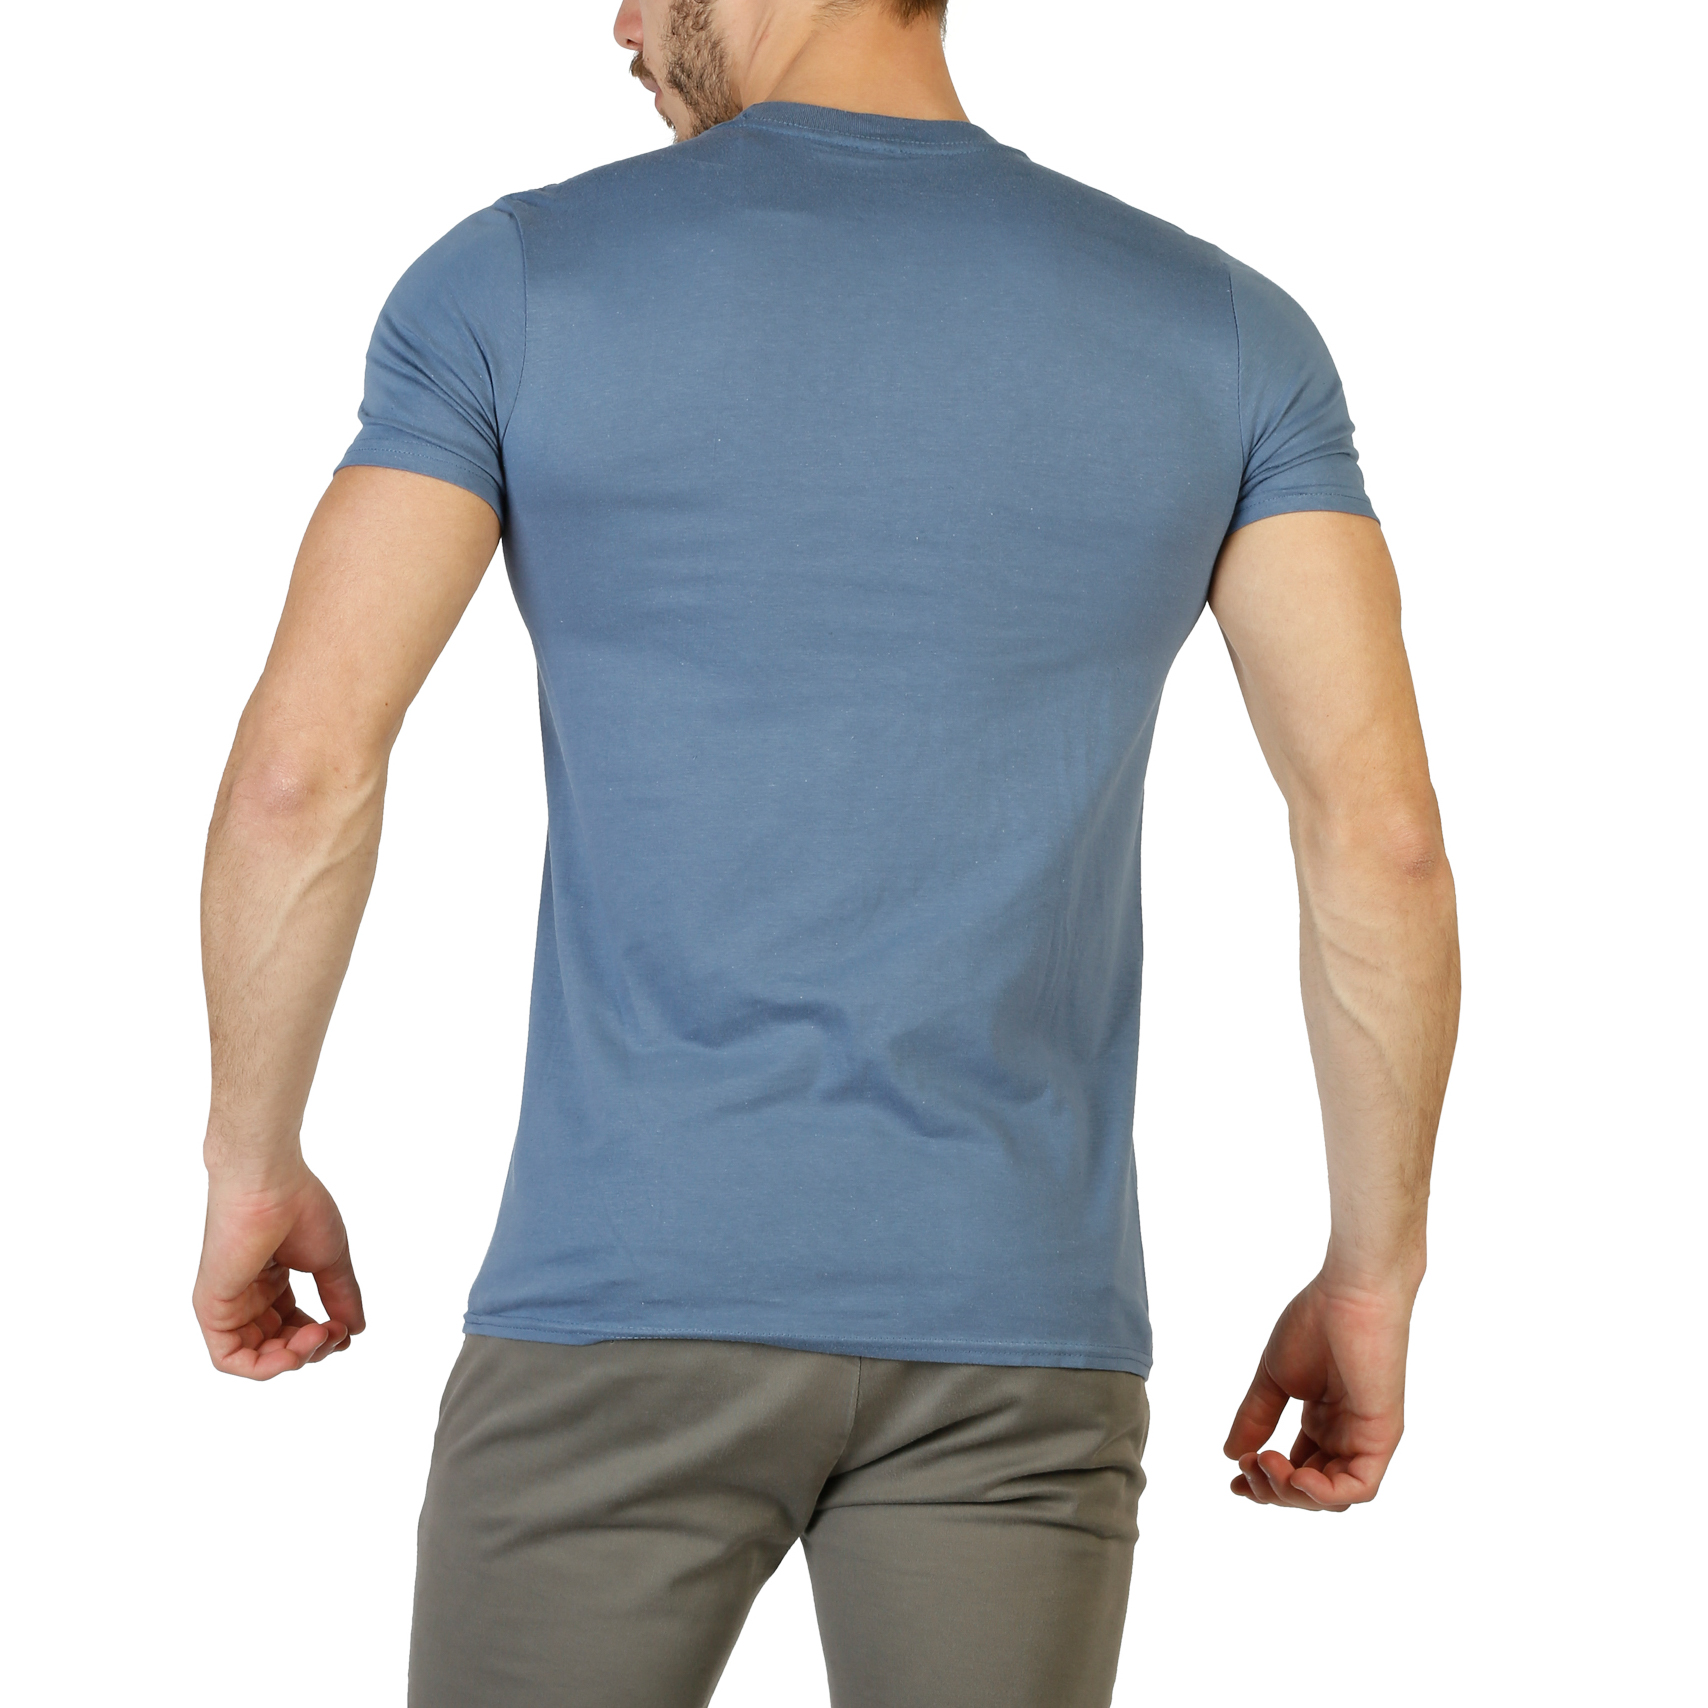 Camisetas-DC-Comics-Hombre-RGMTS211-Blanco-Gris-Azul-Primavera-Verano